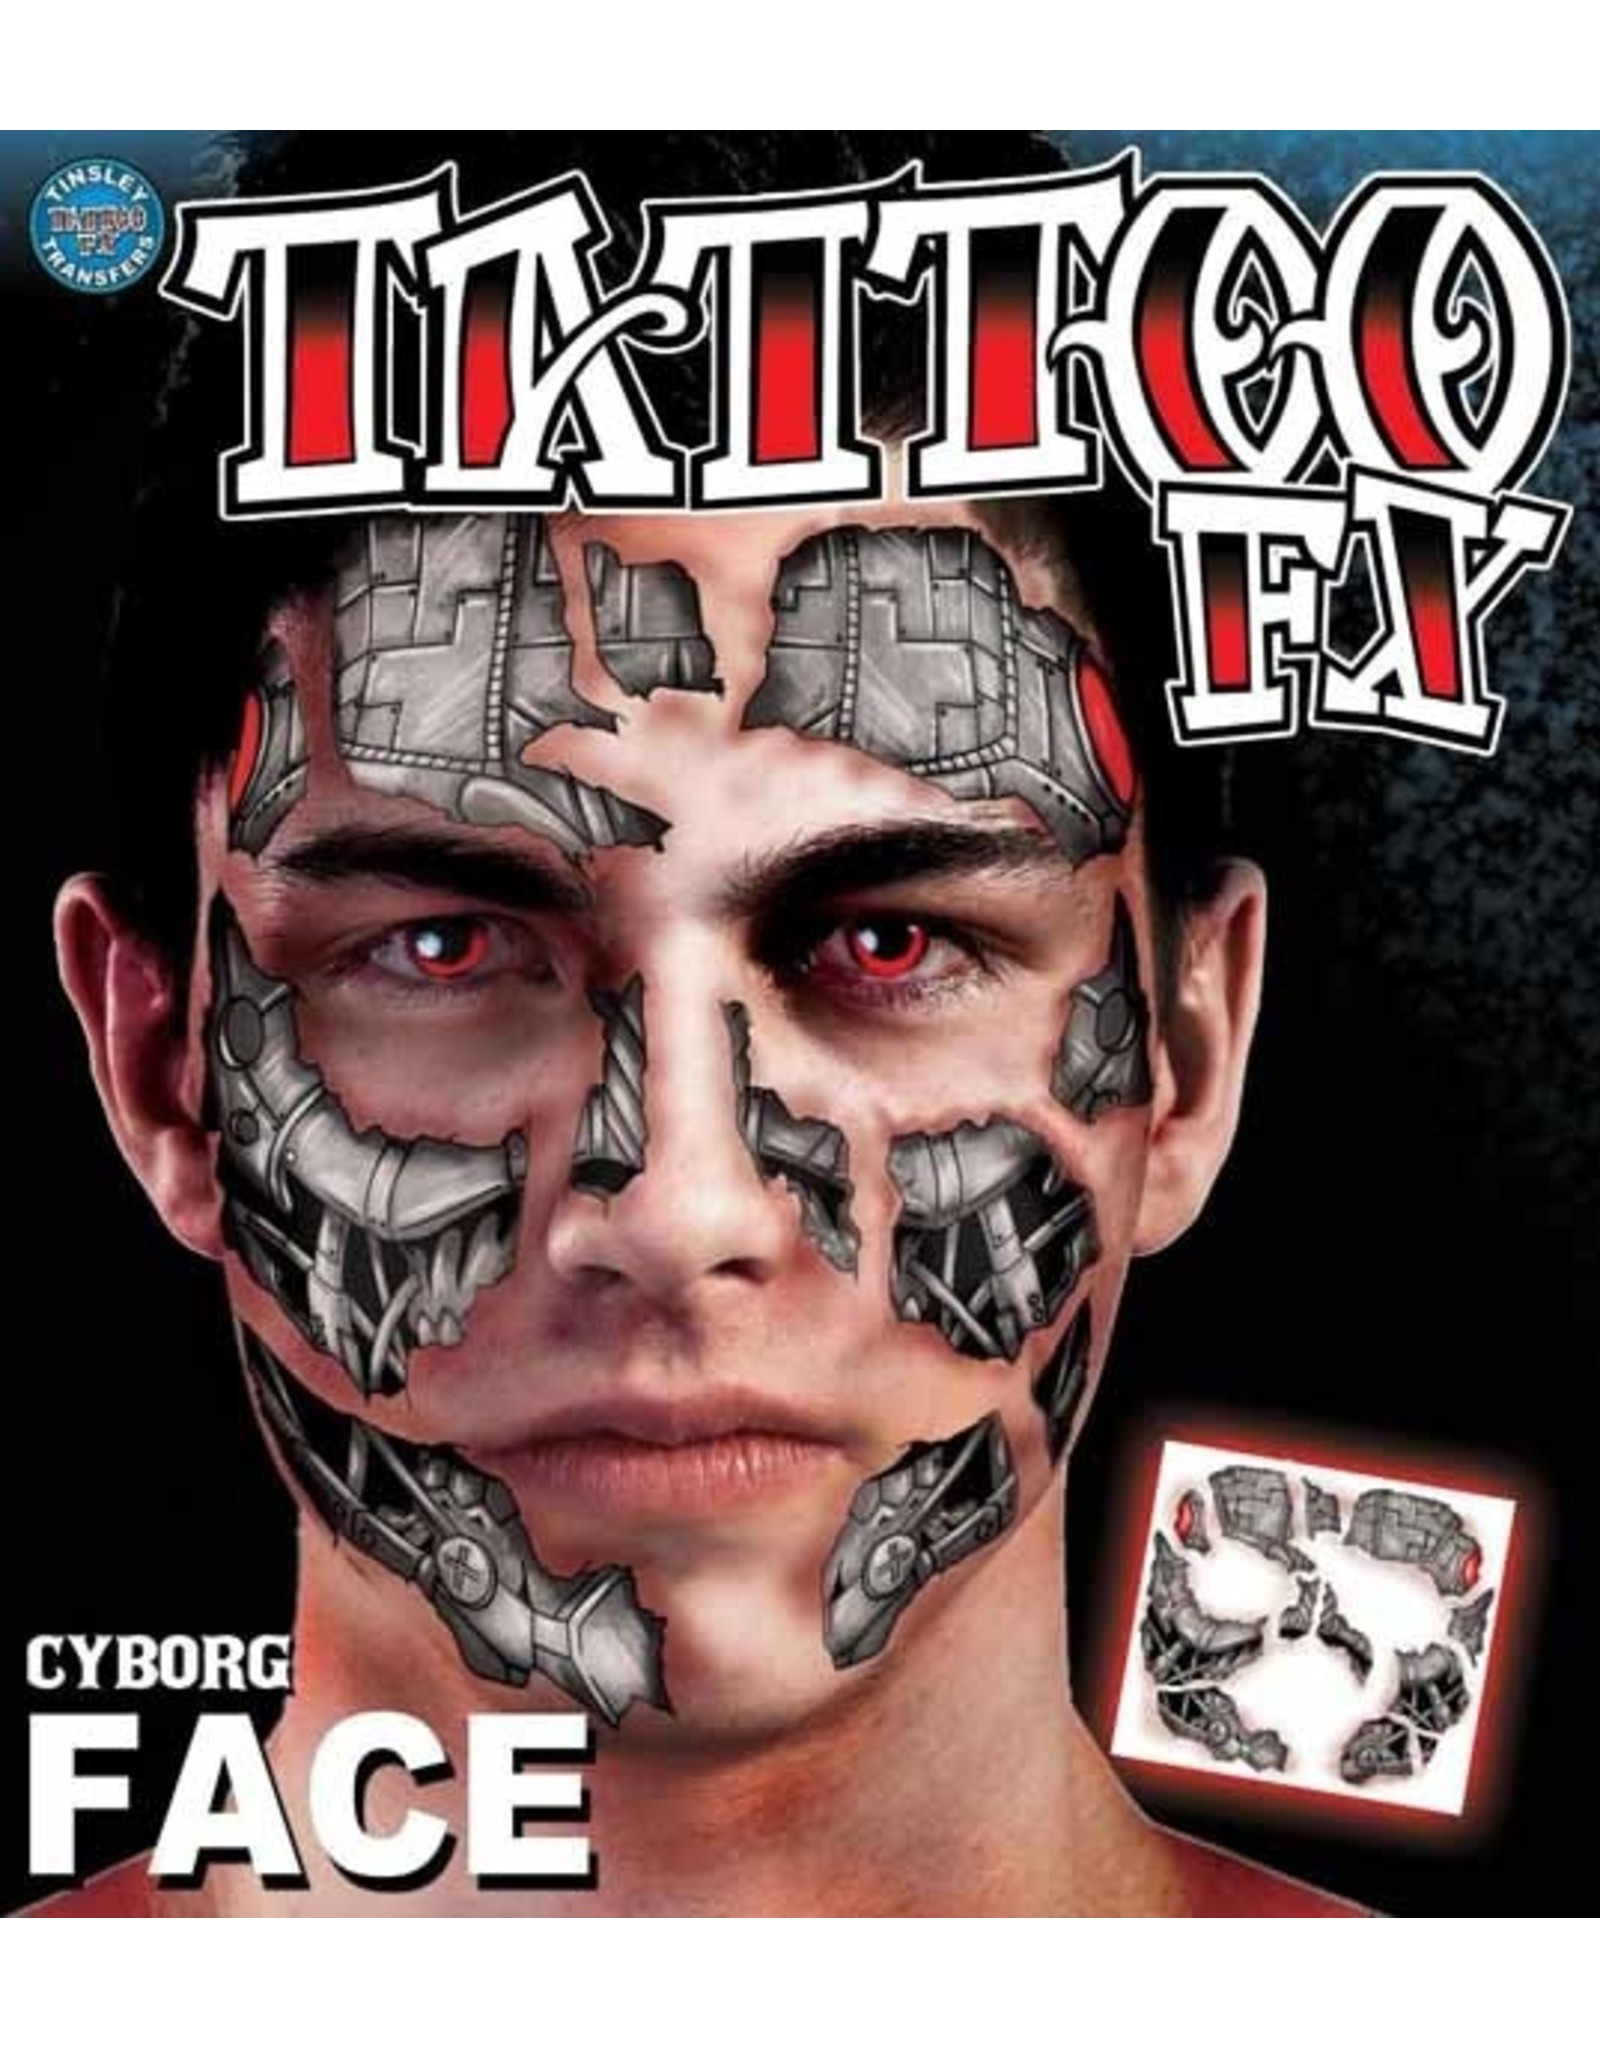 Tinsley Transfers Cyborg Face Tattoo